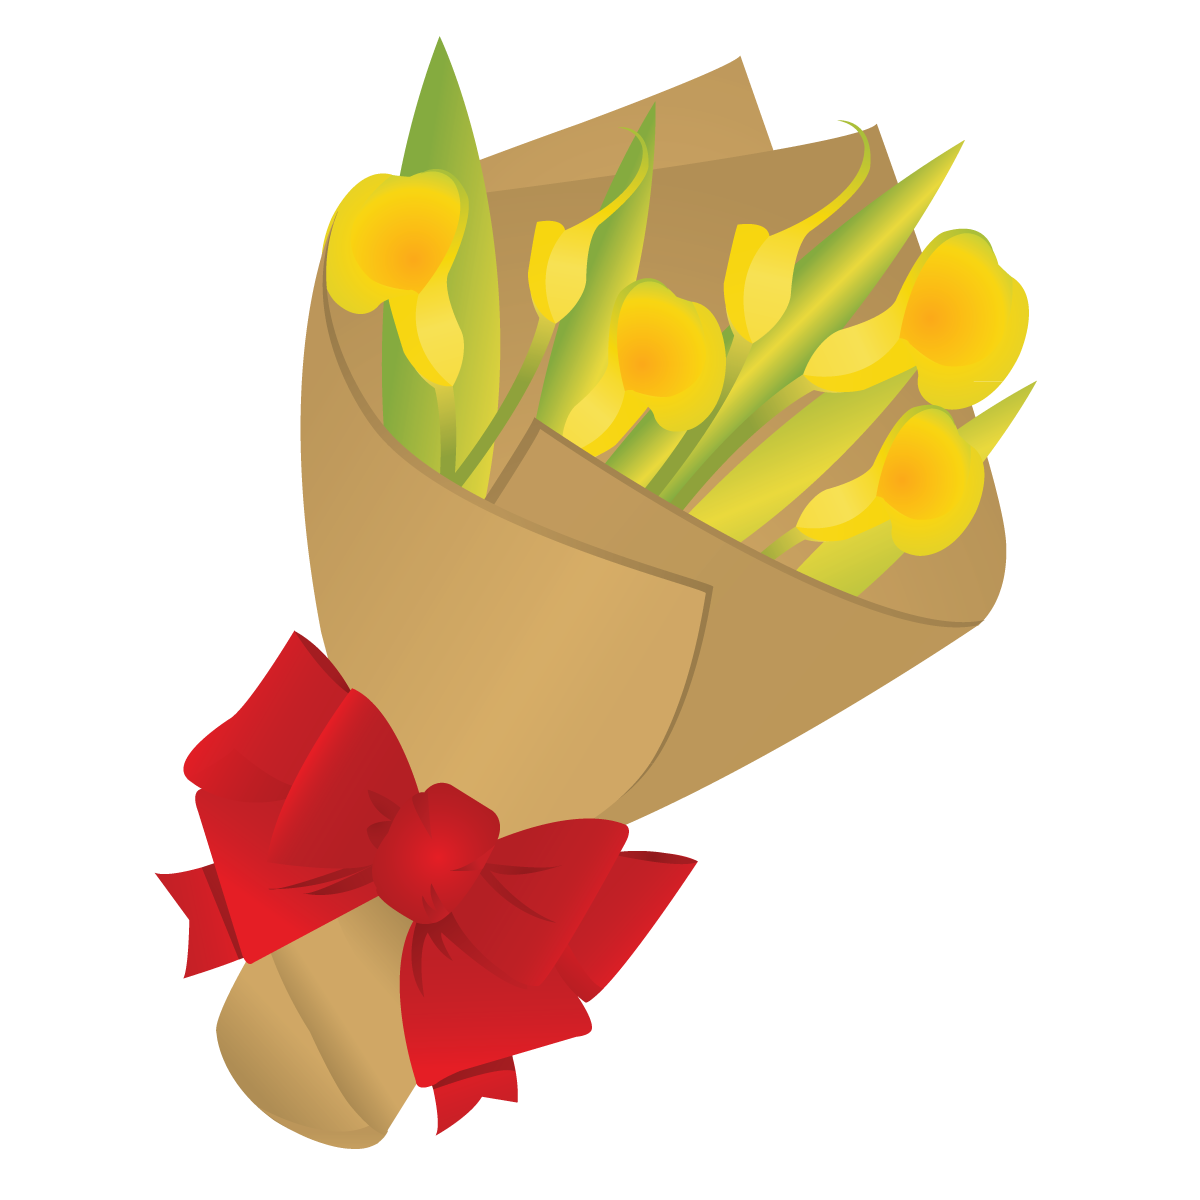 Flower clipart happy mothers day. Preschool clip art free